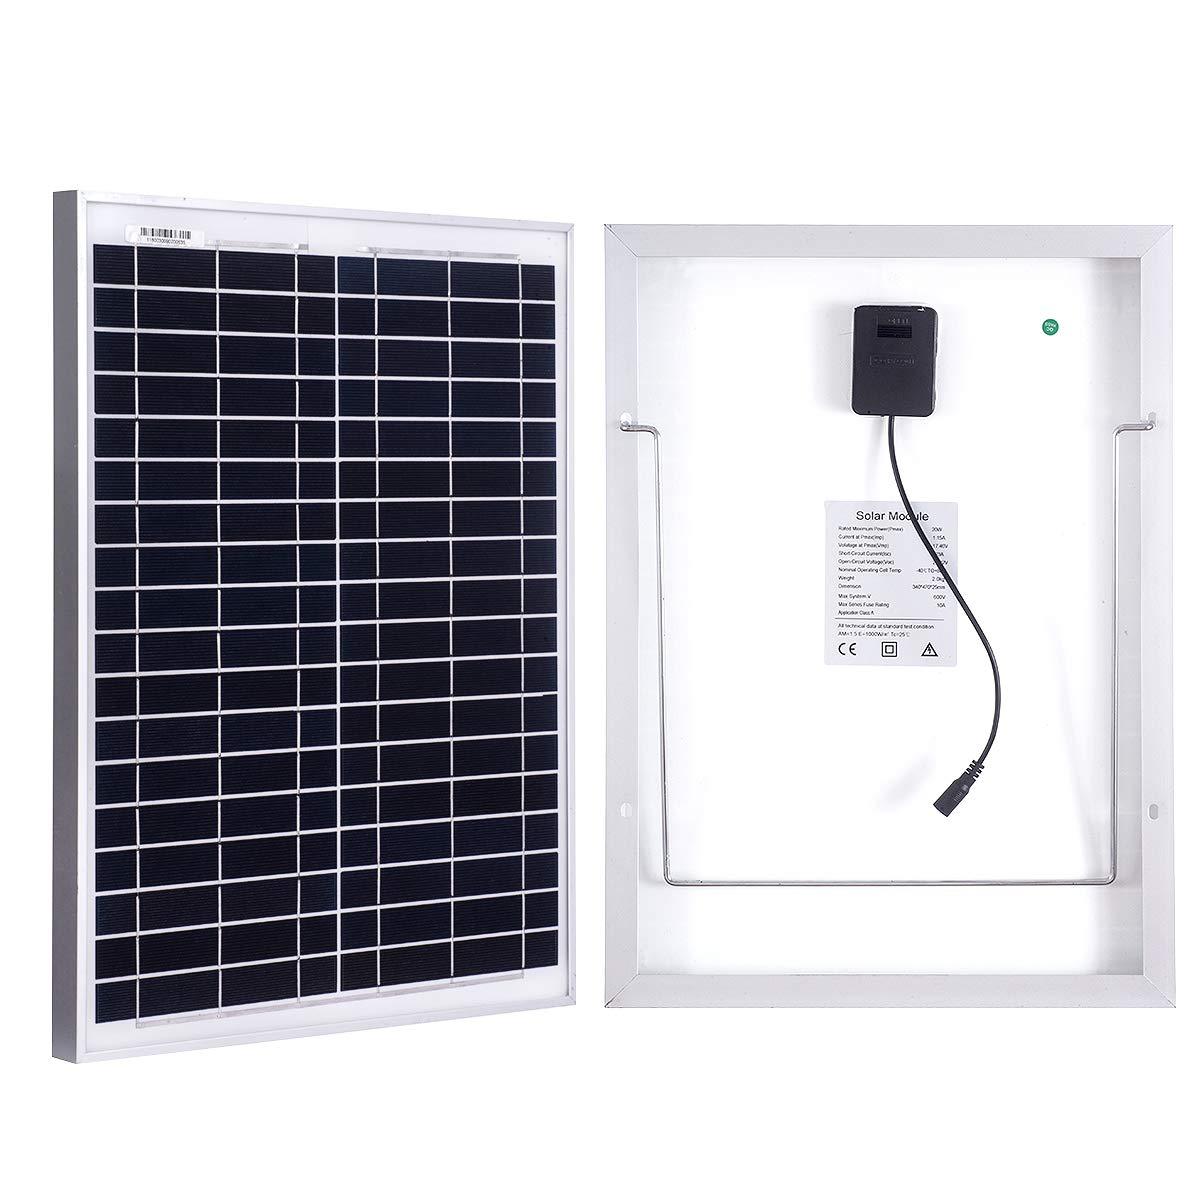 MEGSUN 20W Monocrystalline Solar Panel 12V Battery Charging High Efficiency Suitable for Battery Charging, Module Off Grid Charging RV Boat, Caravan, RV, etc.